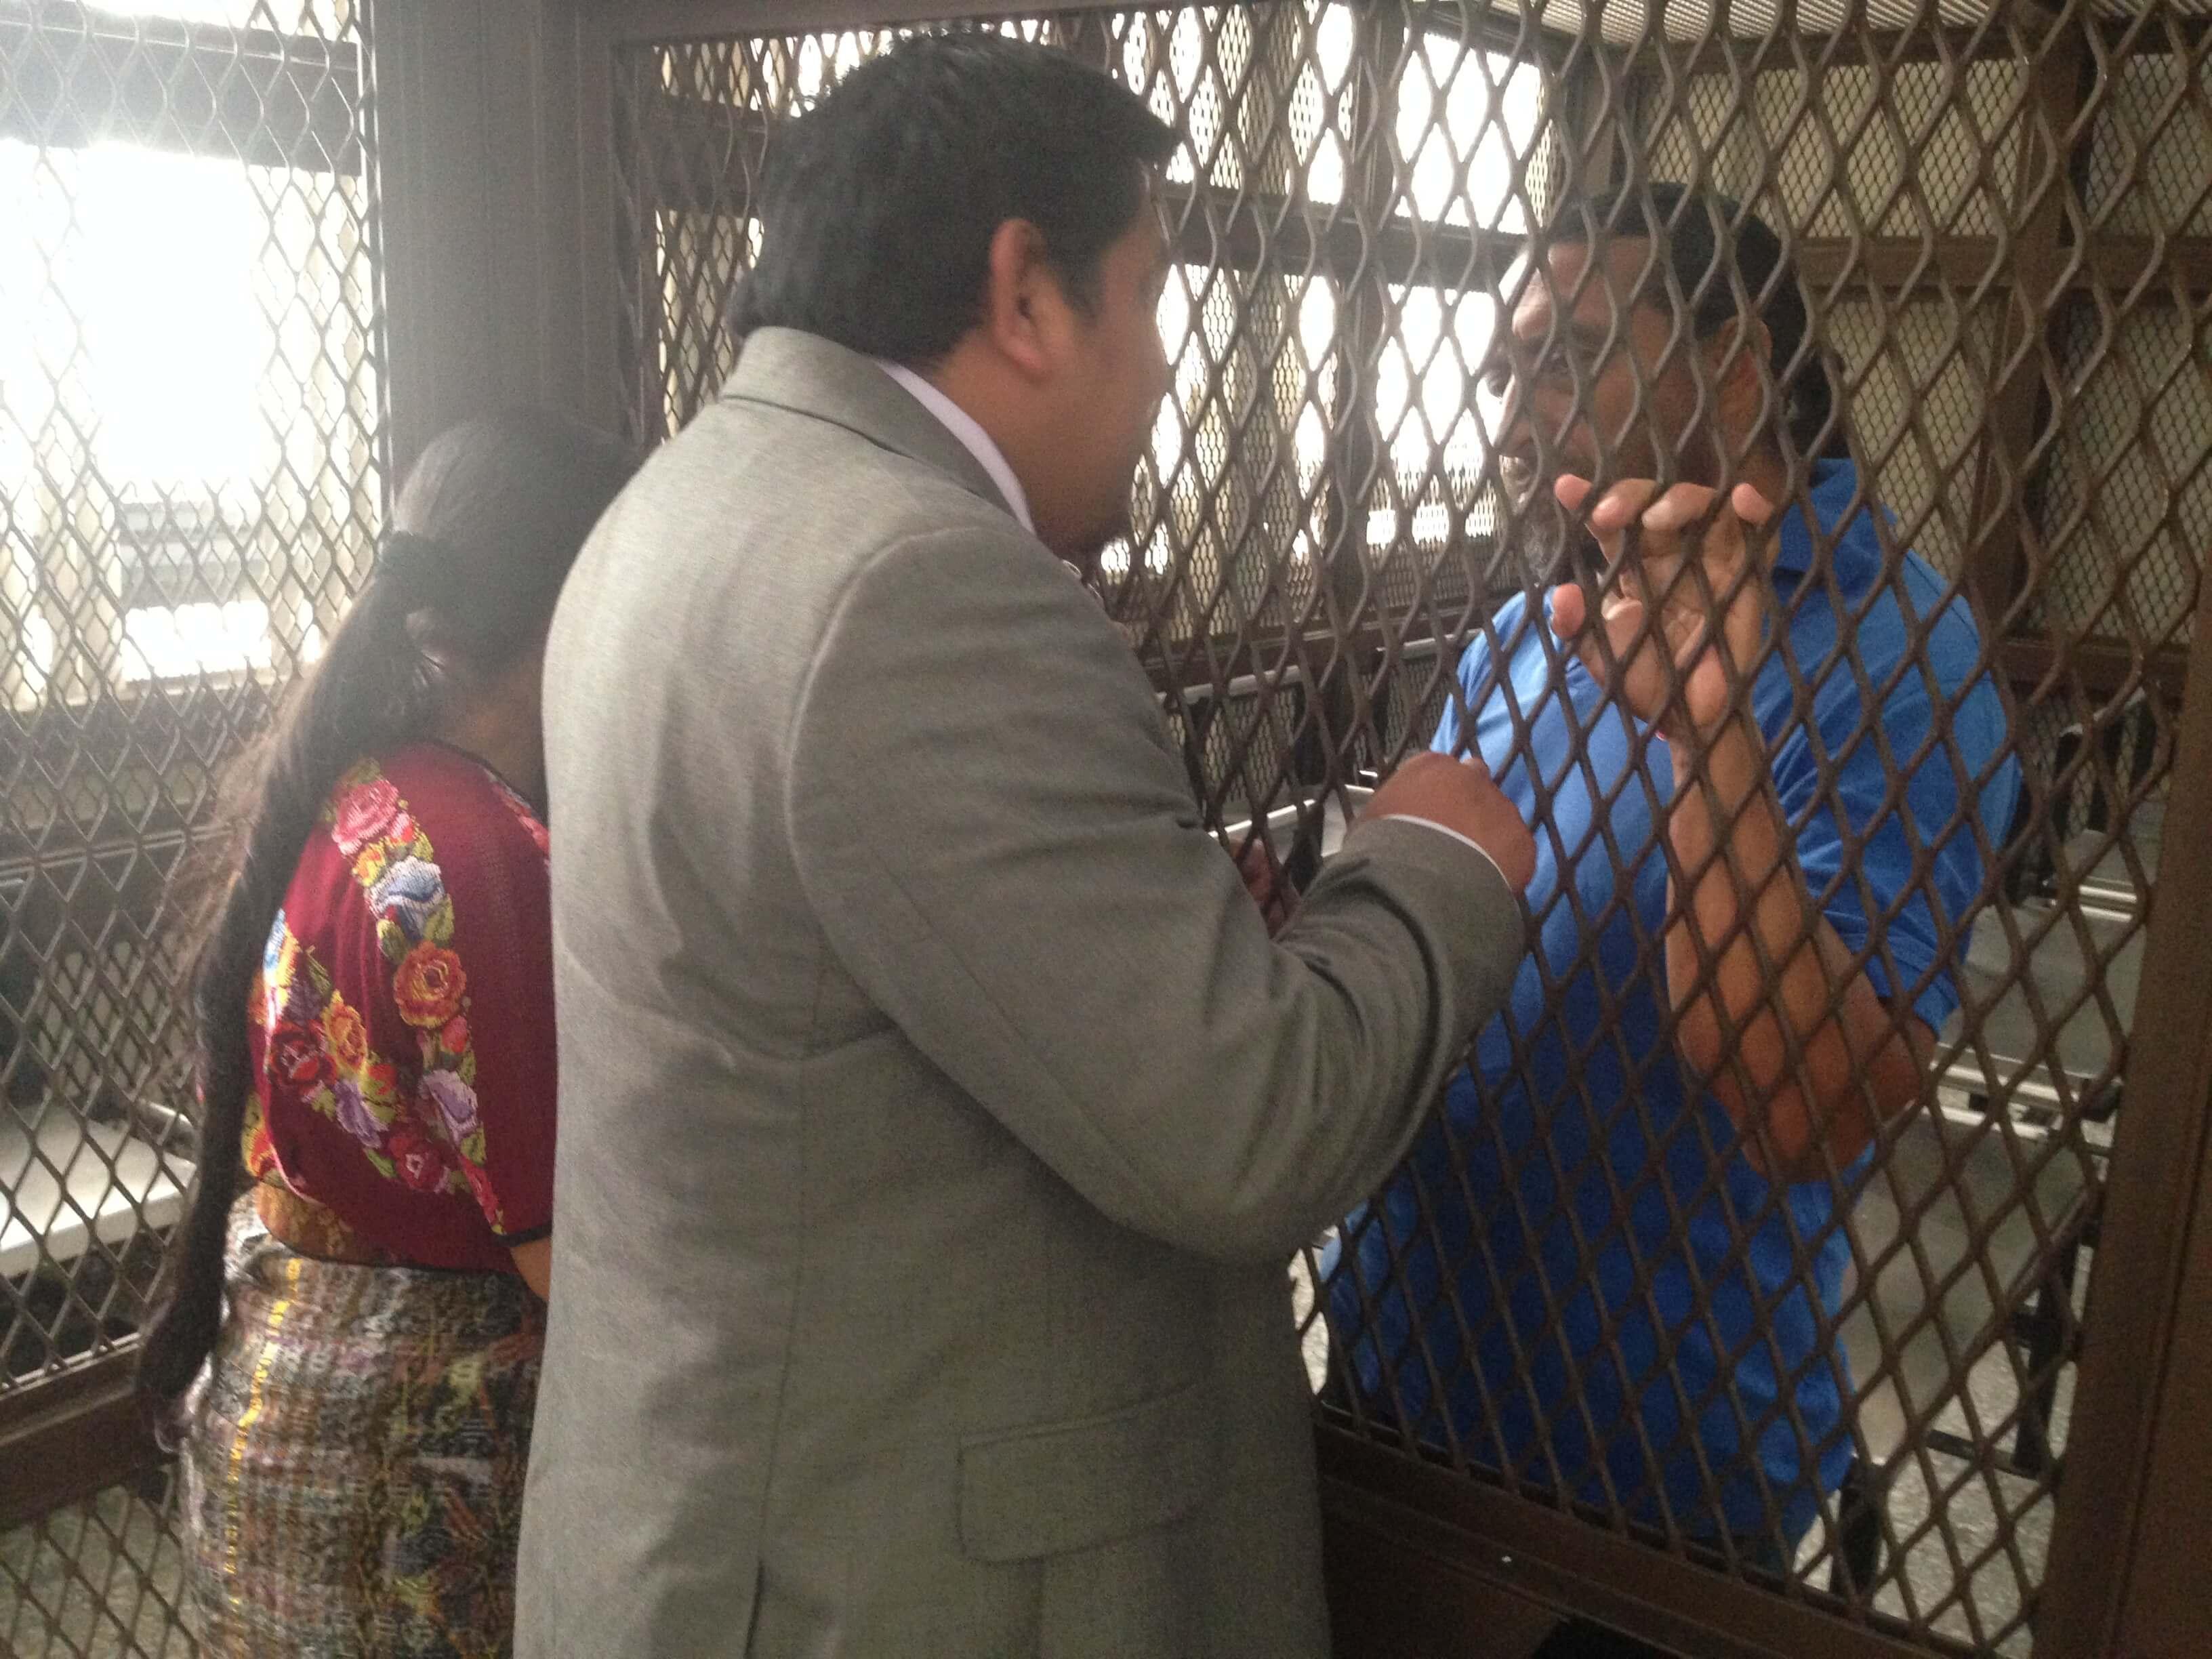 Juan Castro talks to Rigoberto Juarez before the start of the trial.  Photo: José Agry Sian